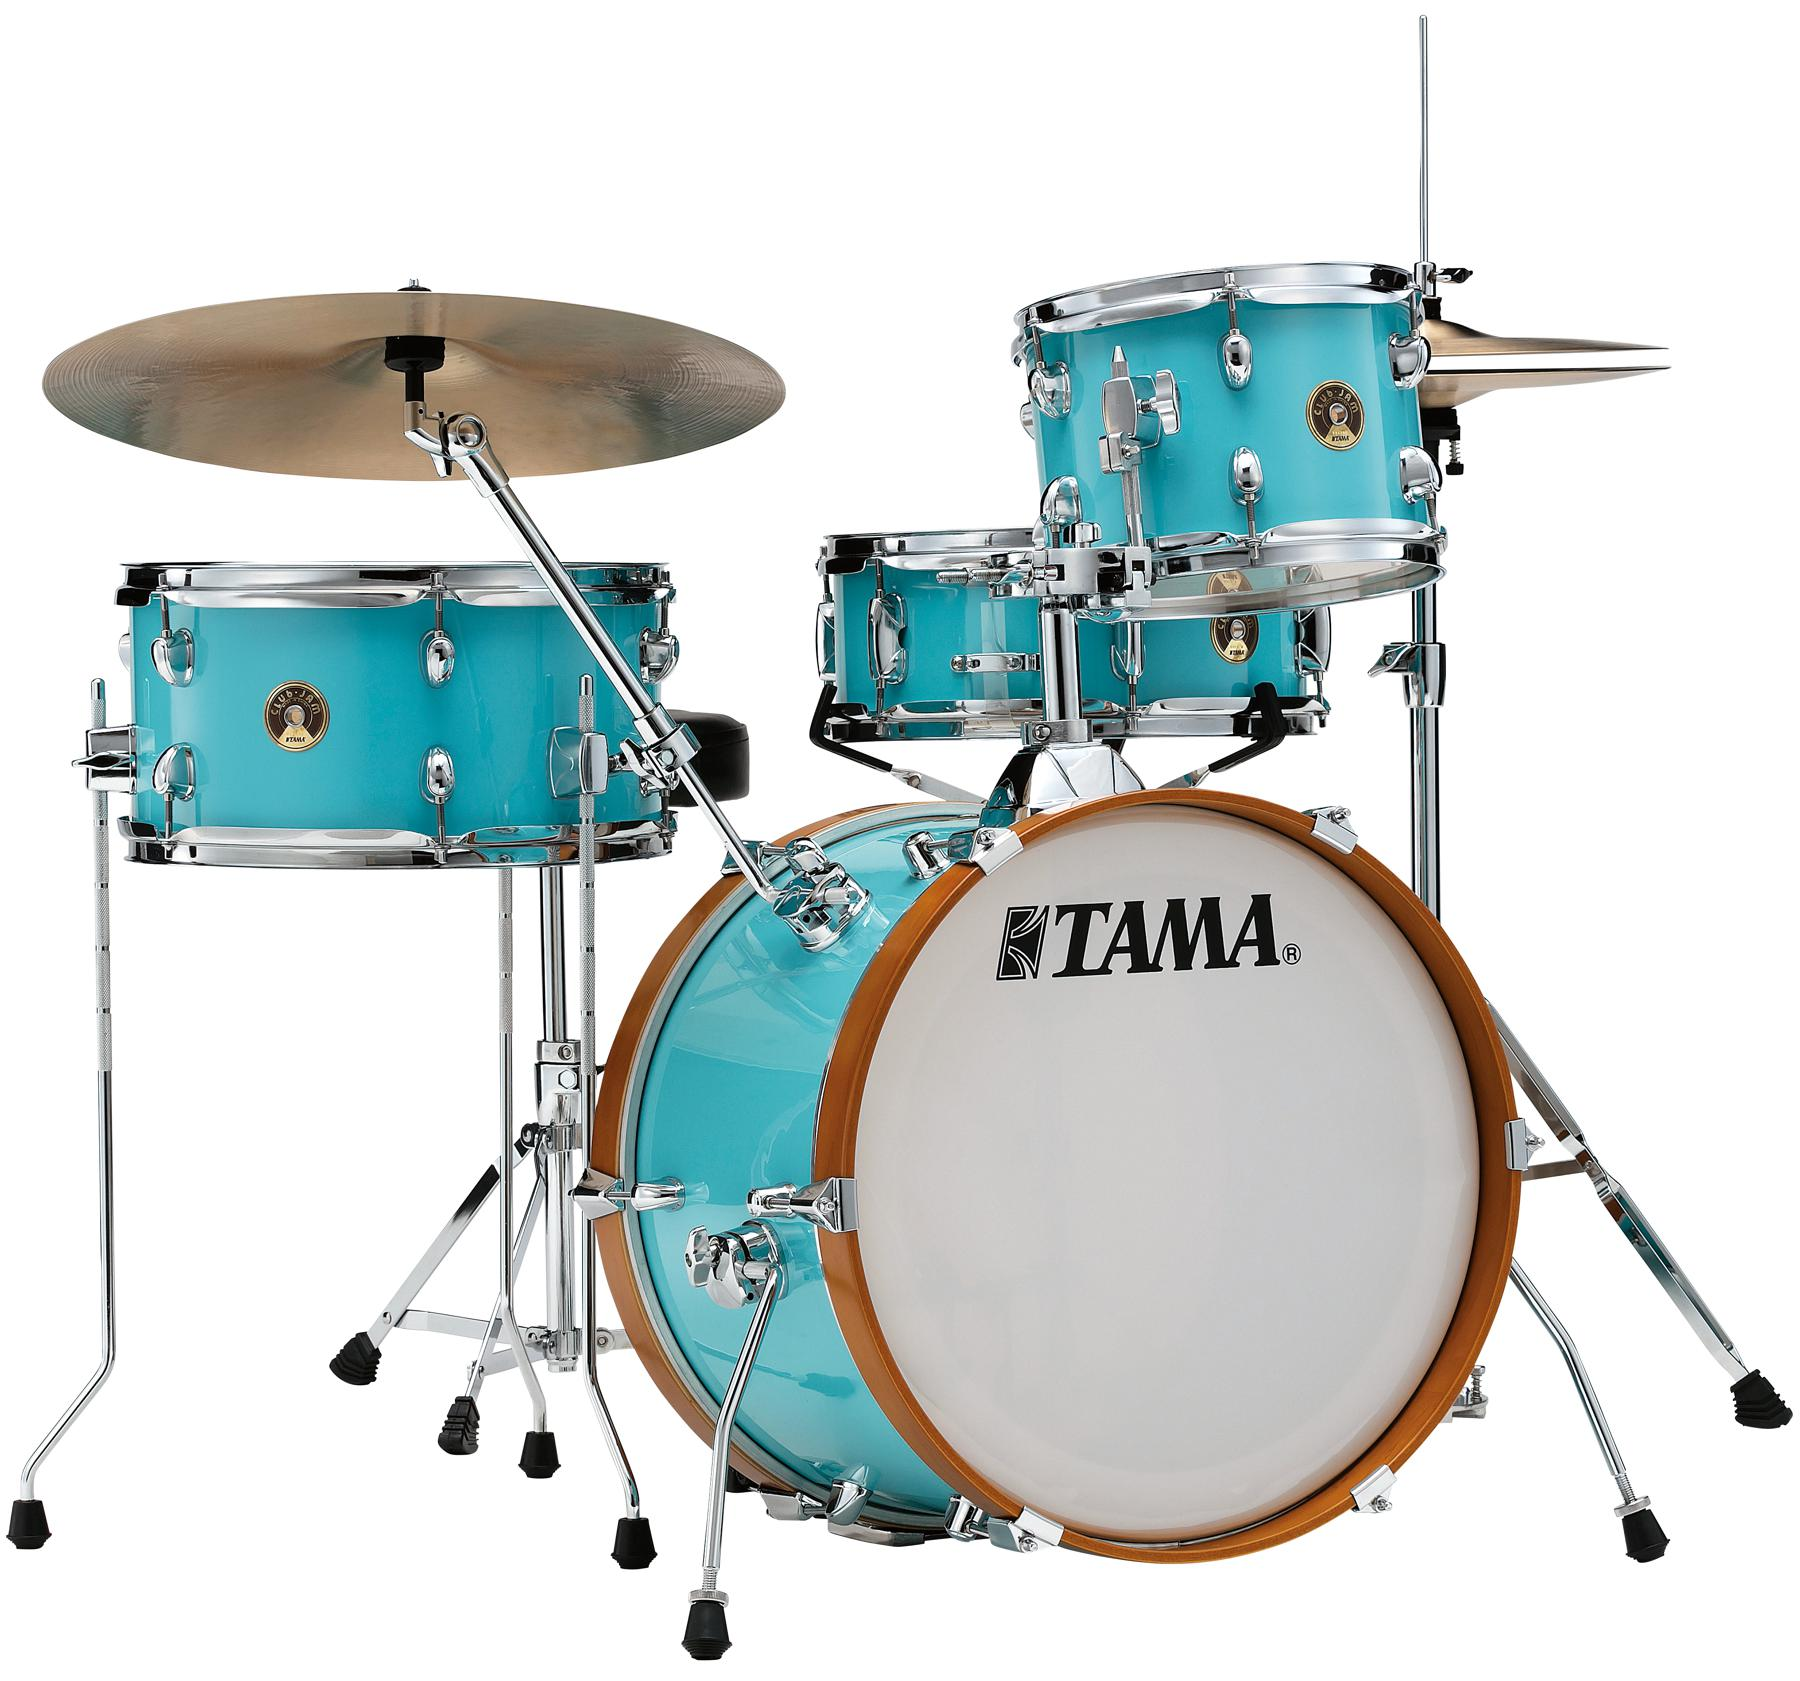 1. Tama Club-Jam Kit